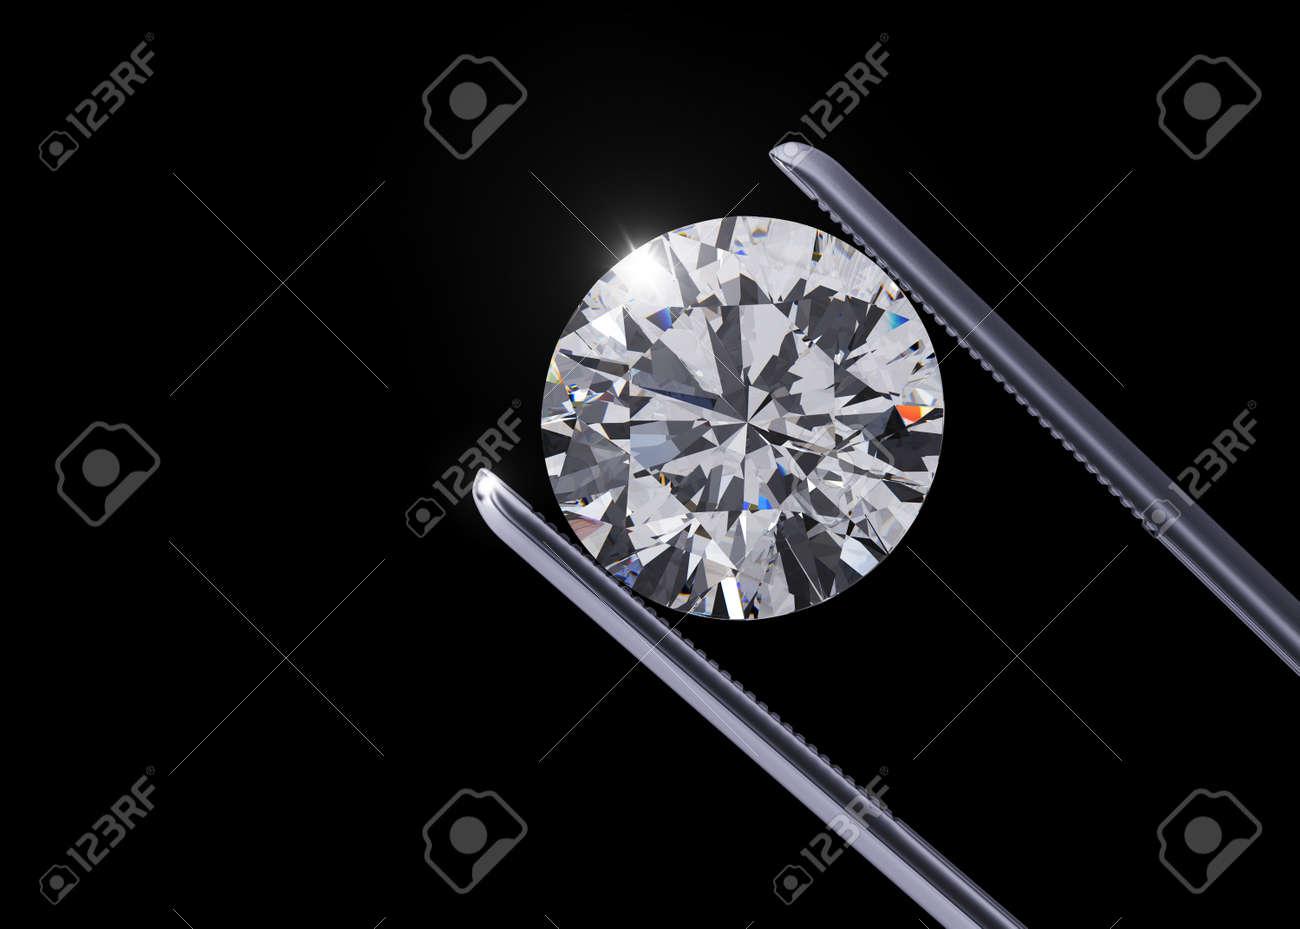 Luxury diamond in tweezers closeup with dark background - 45148676